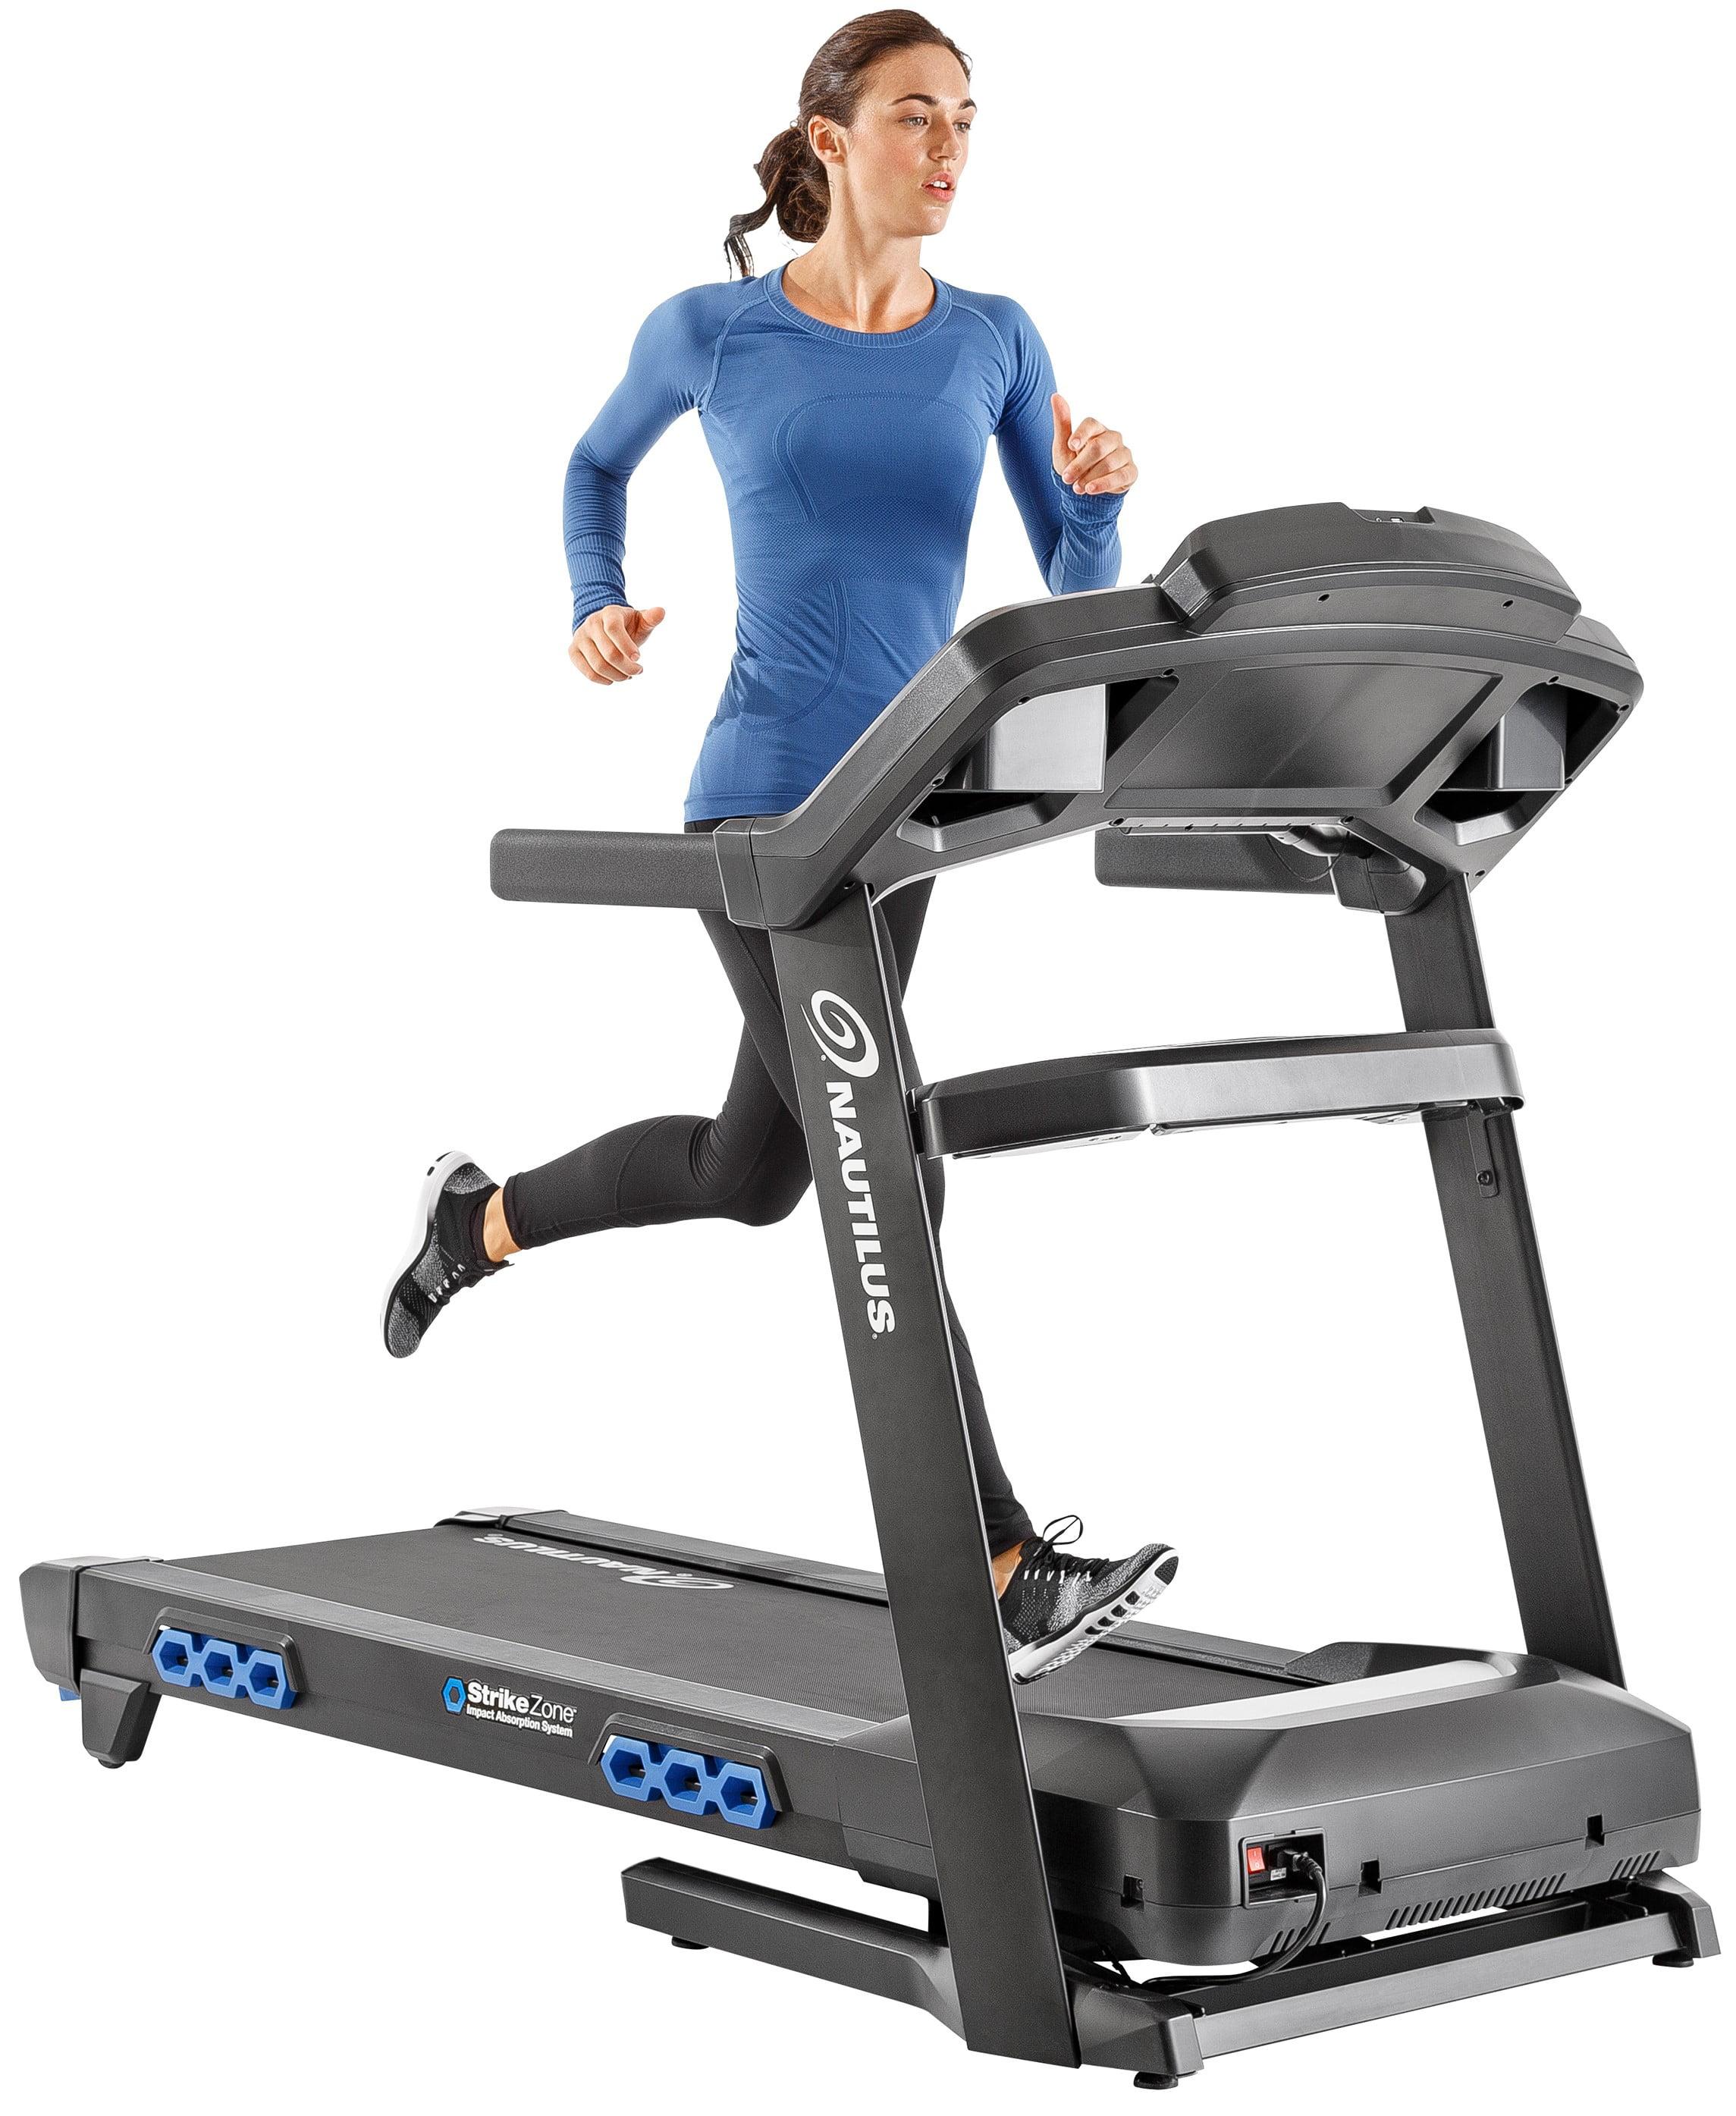 Nautilus T616 Bluetooth Treadmill with RunSocial & Nautilus Trainer 2 App Connectivity